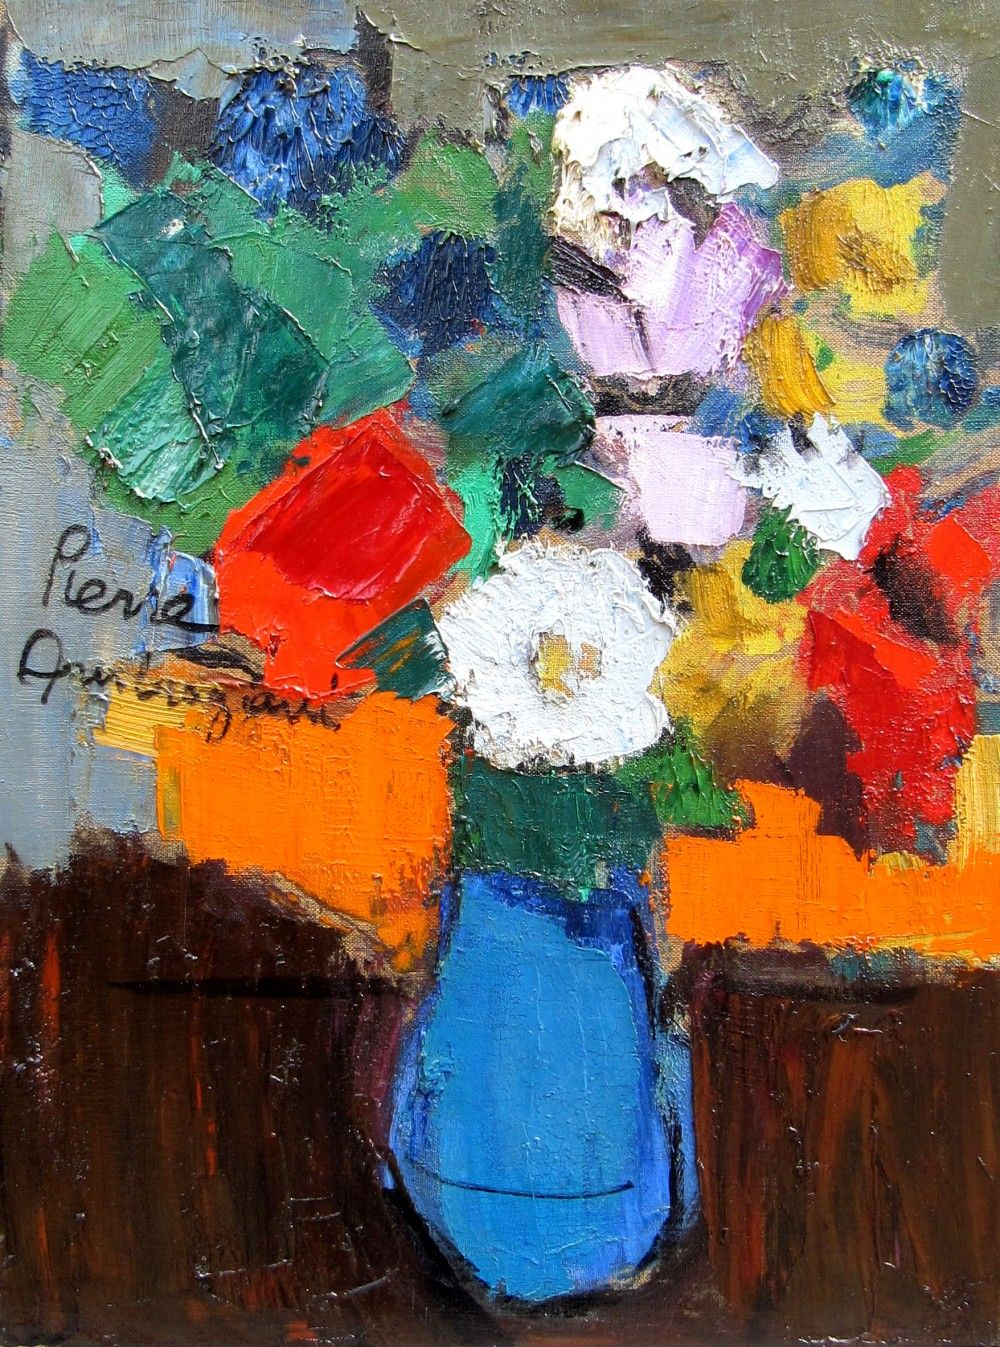 Pierre Ambrogiani | Flower painting, Flower art, Art